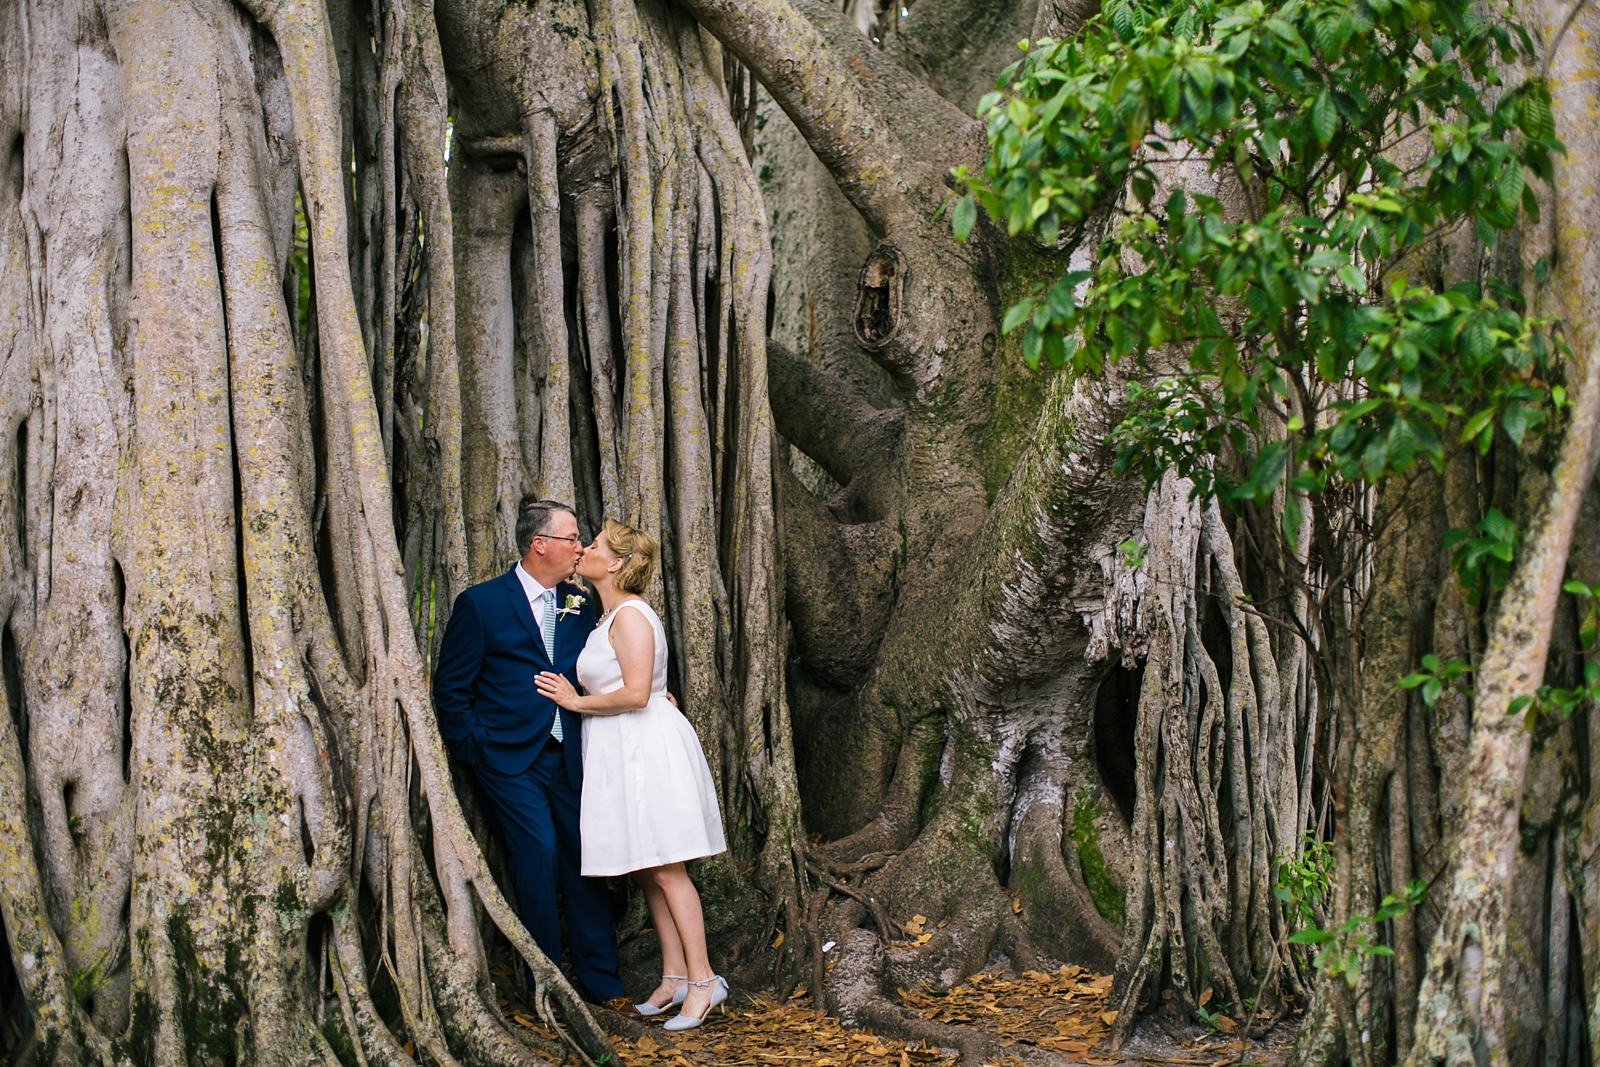 17-los-angeles-wedding-photographer-fort-lauderdale.jpg